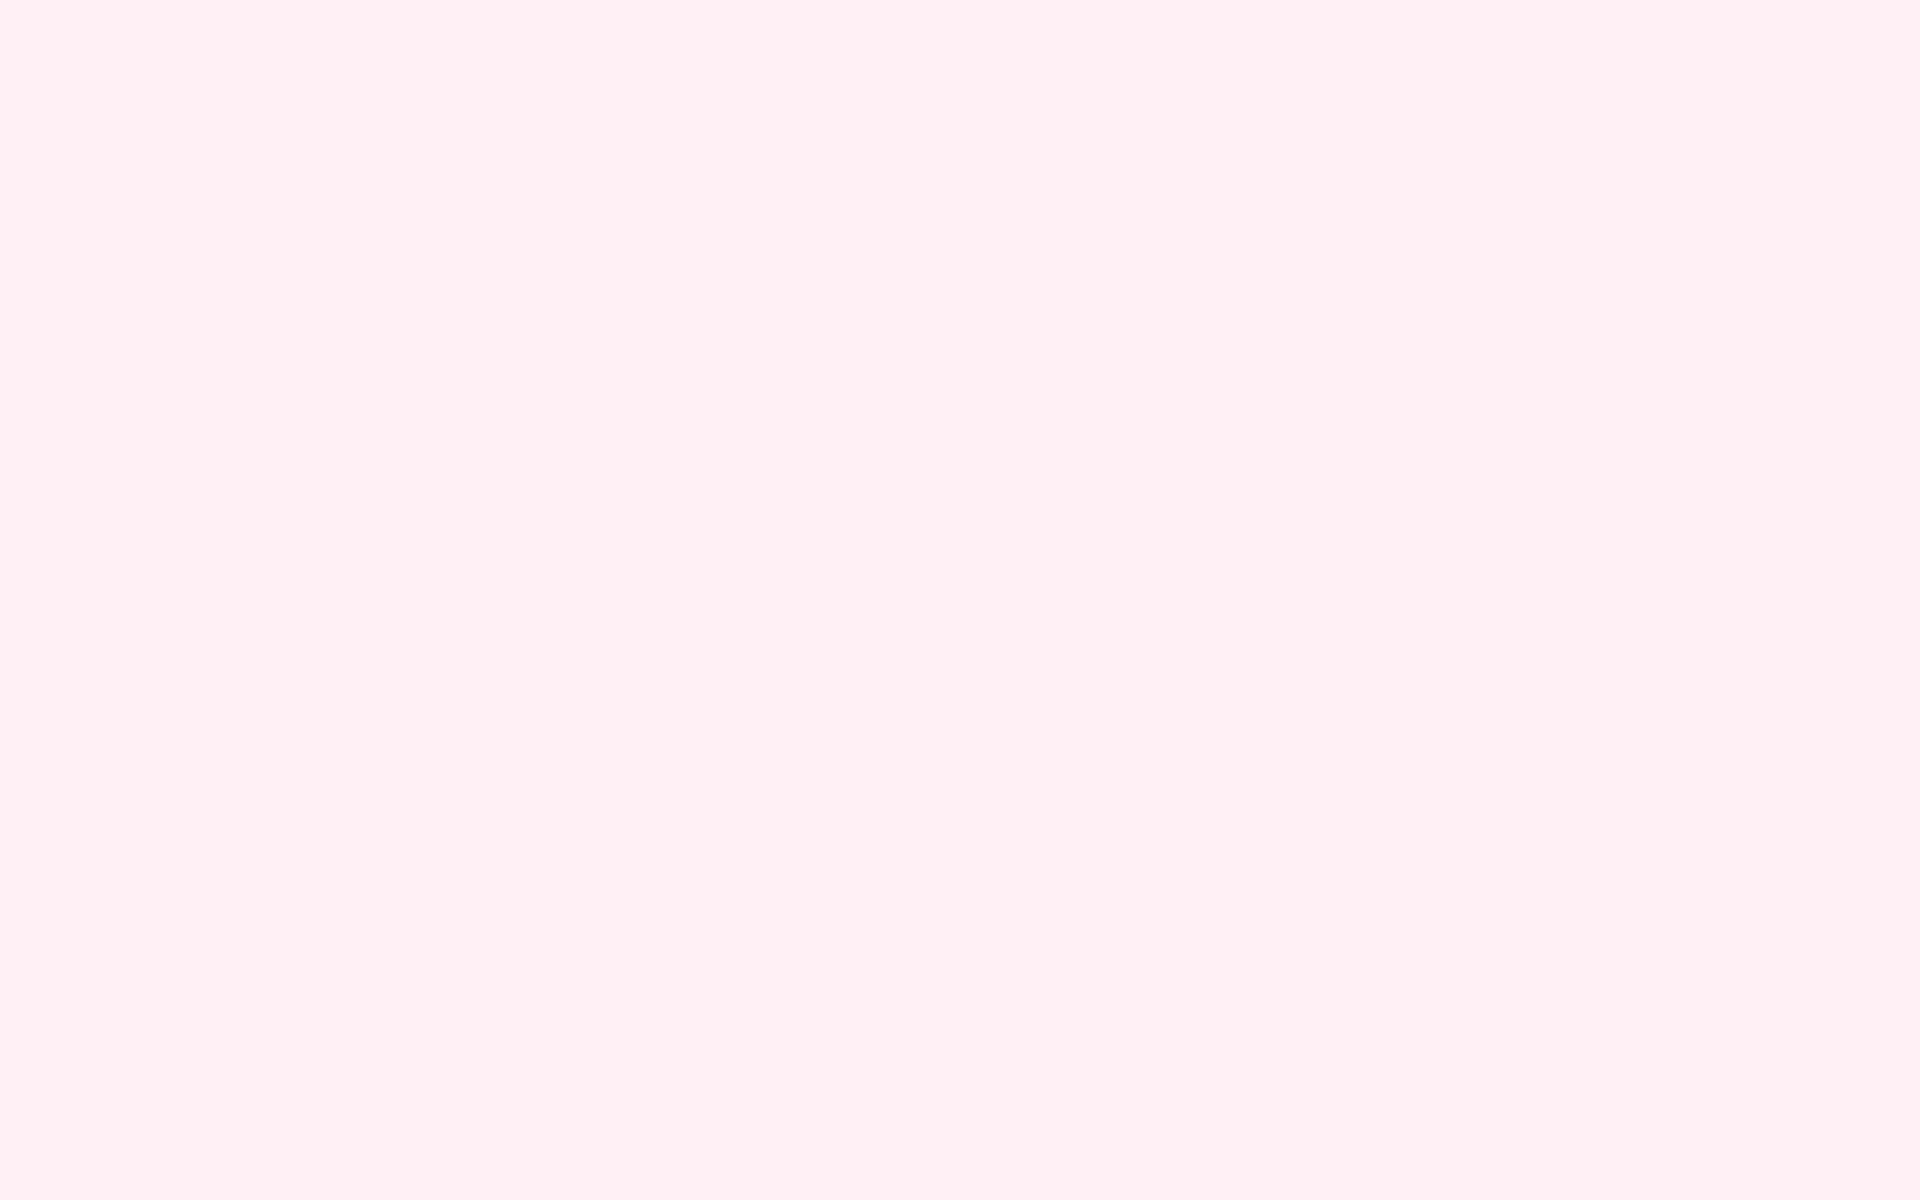 1920x1200 Lavender Blush Solid Color Background